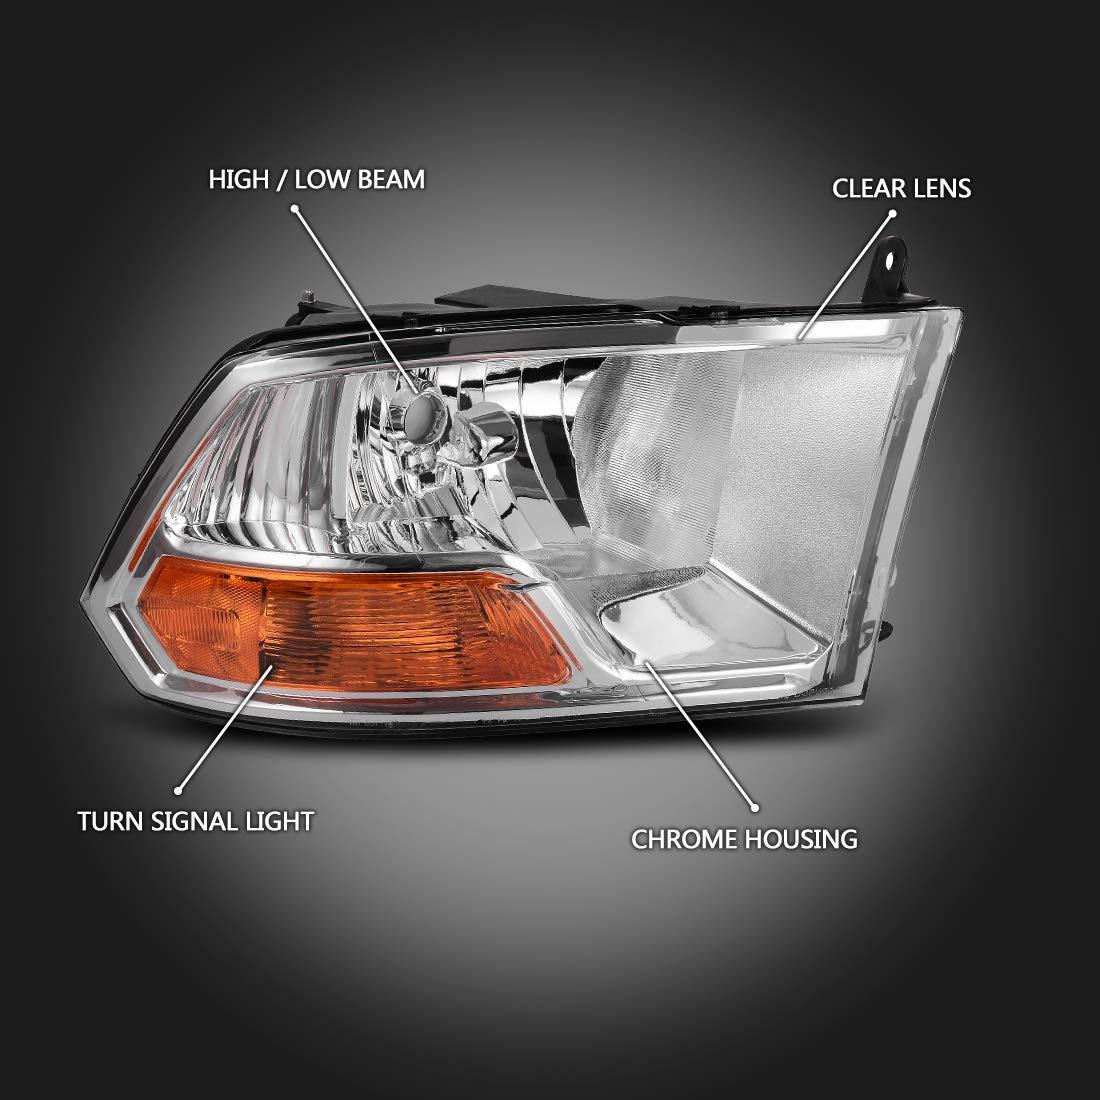 100W Halogen 6 inch 2014 Dodge RAM 1500 QUAD CAB Post mount spotlight -Chrome Passenger side WITH install kit